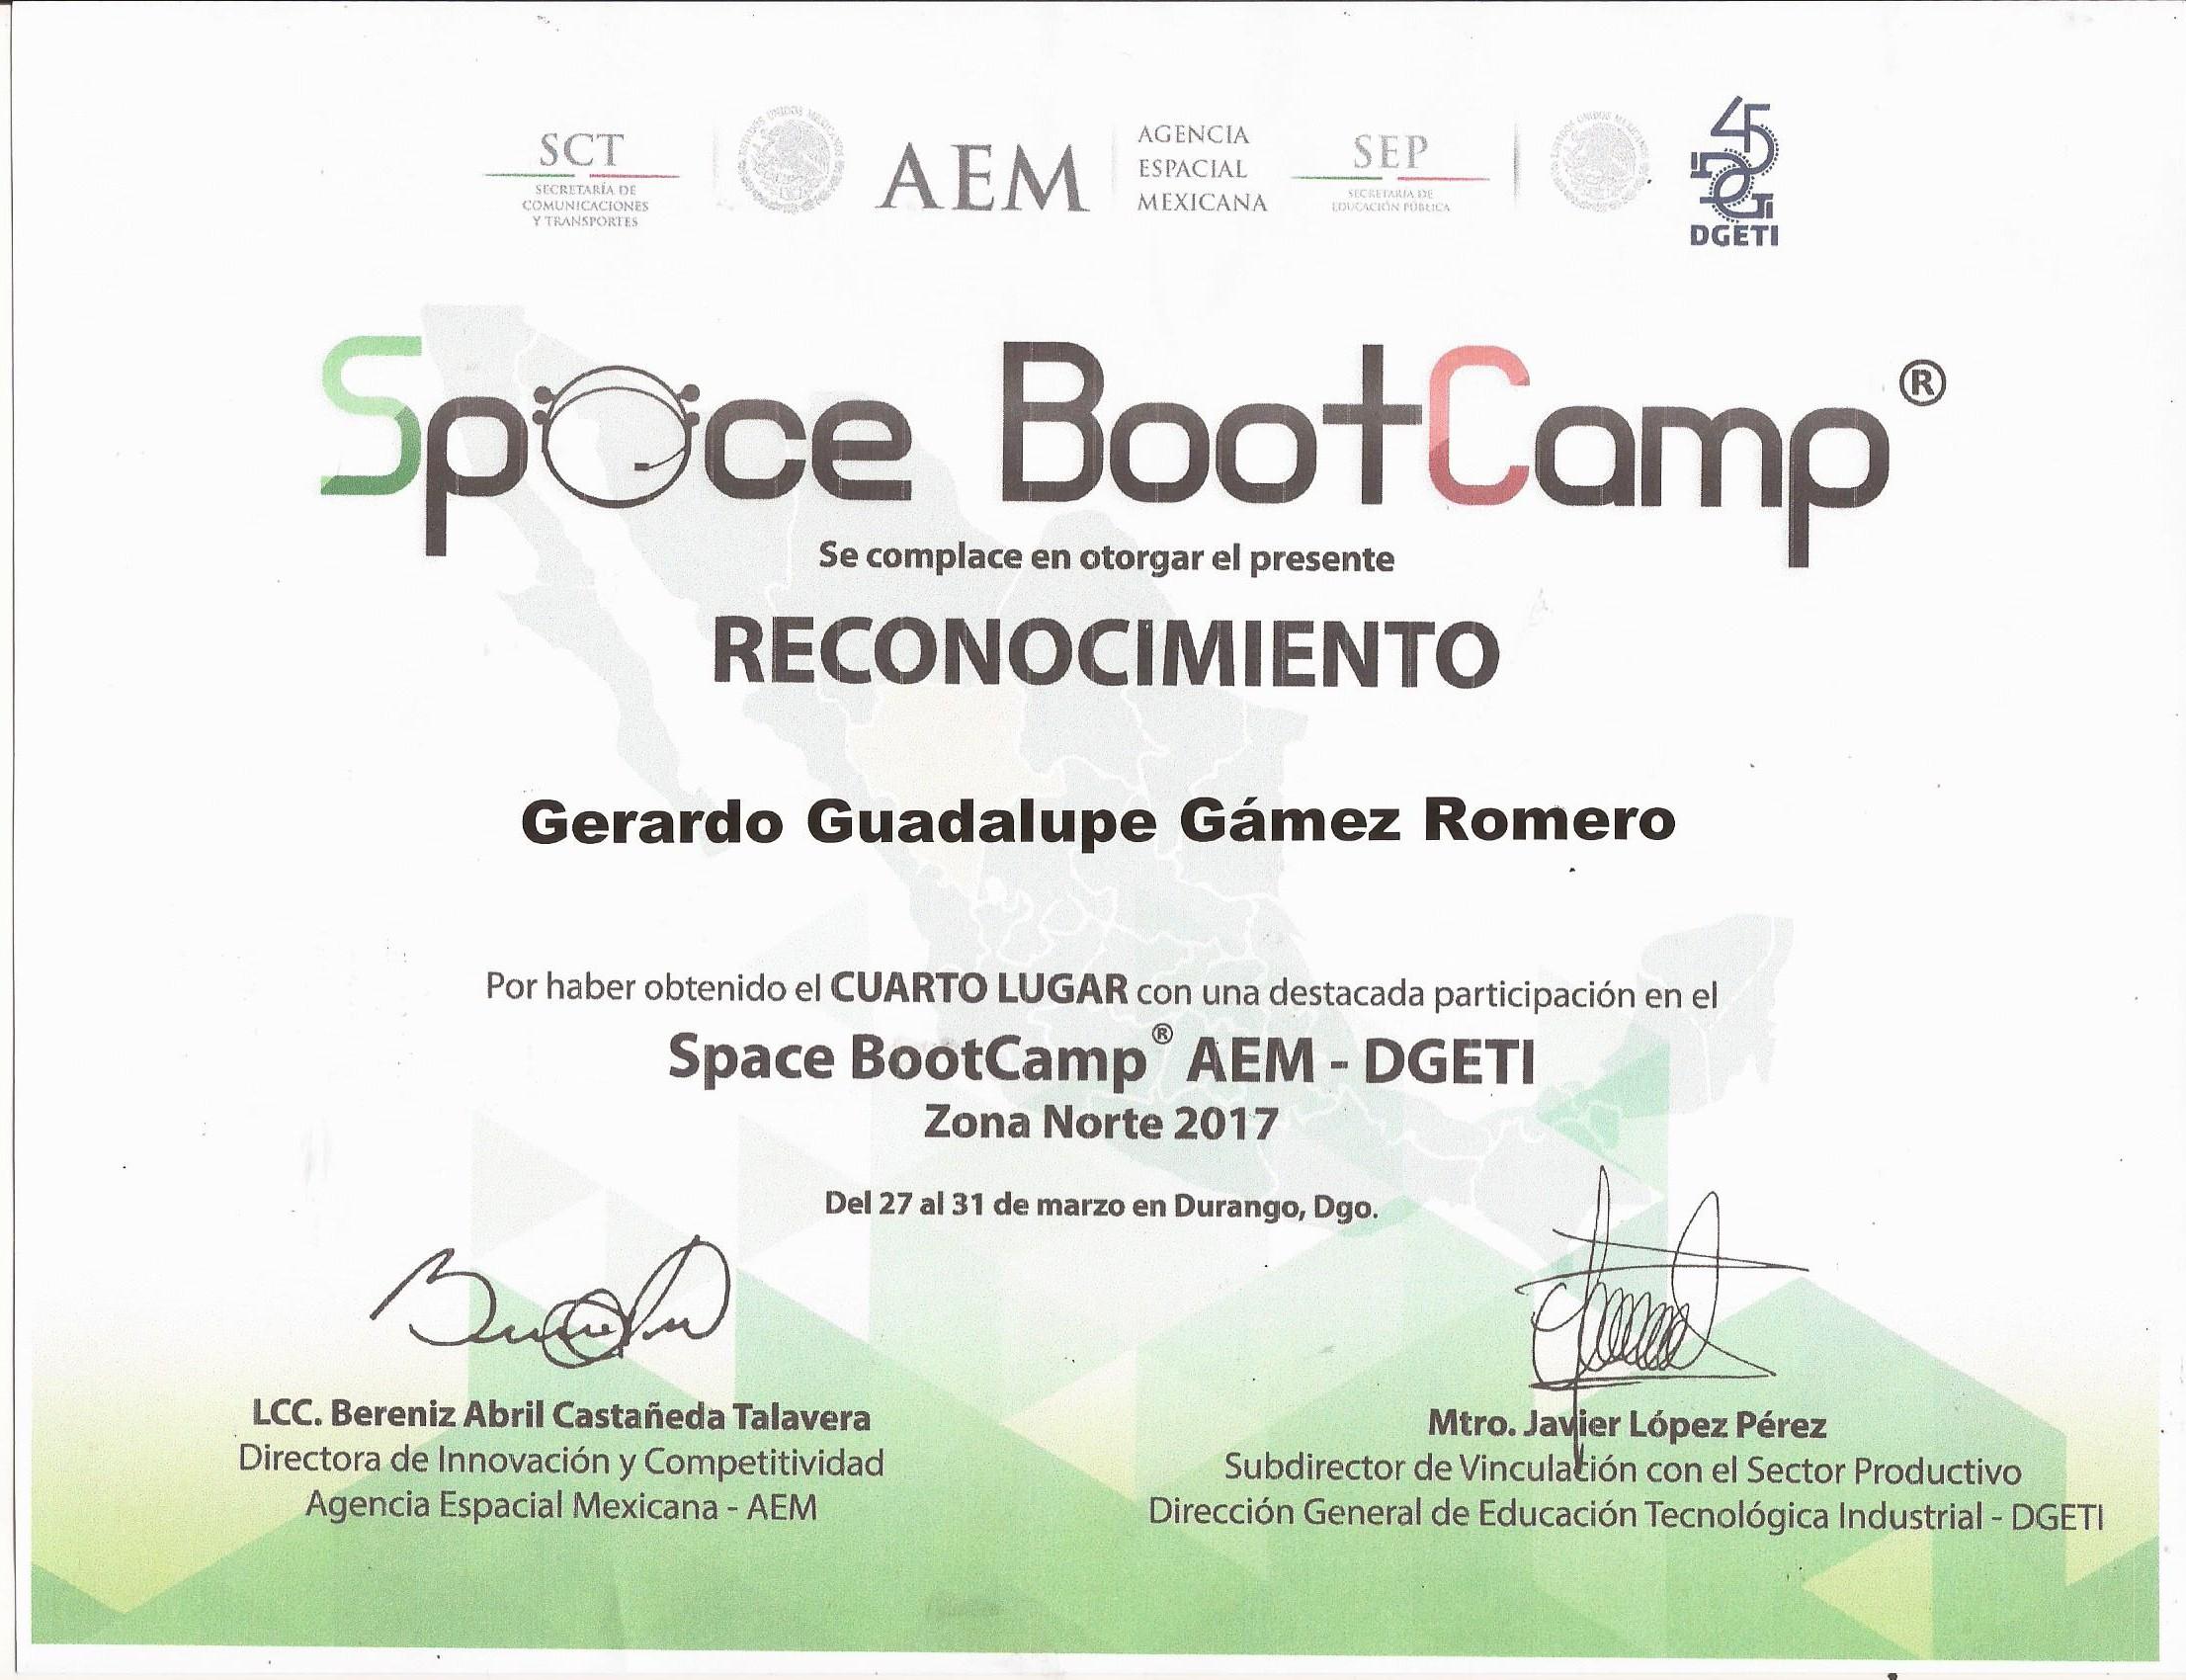 GAMEZ ROMERO 4 LUGAR